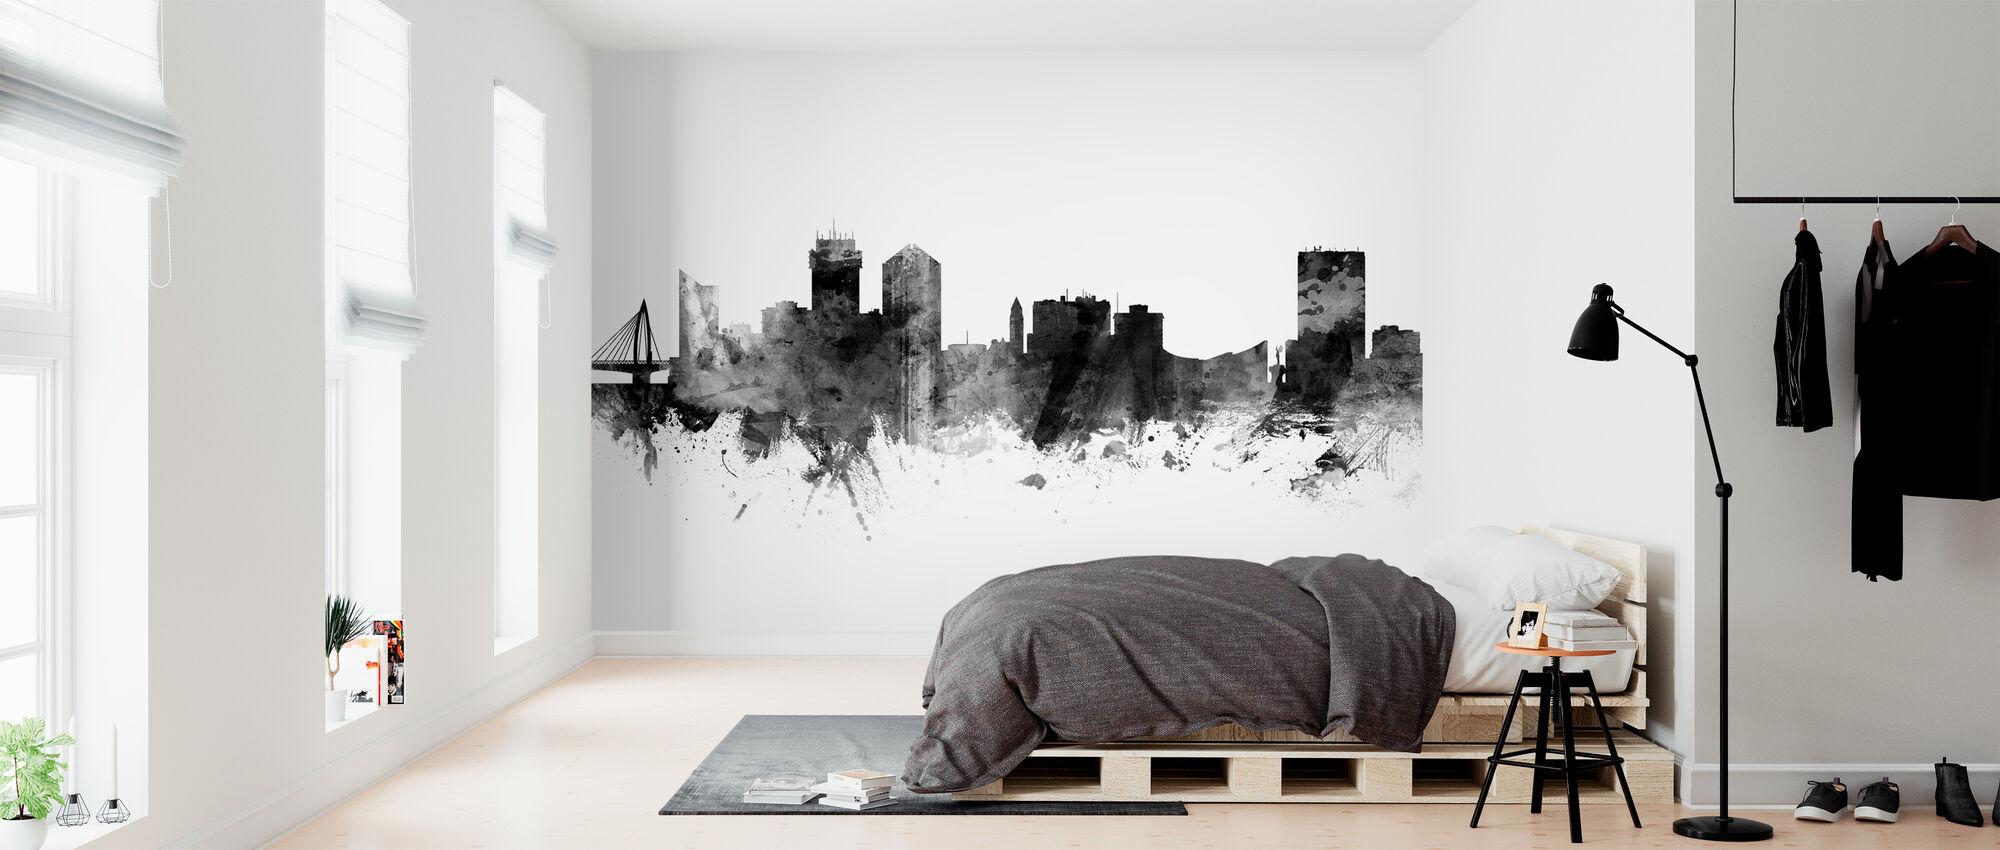 Wichita Kansas Skyline, black and white - Wallpaper - Bedroom